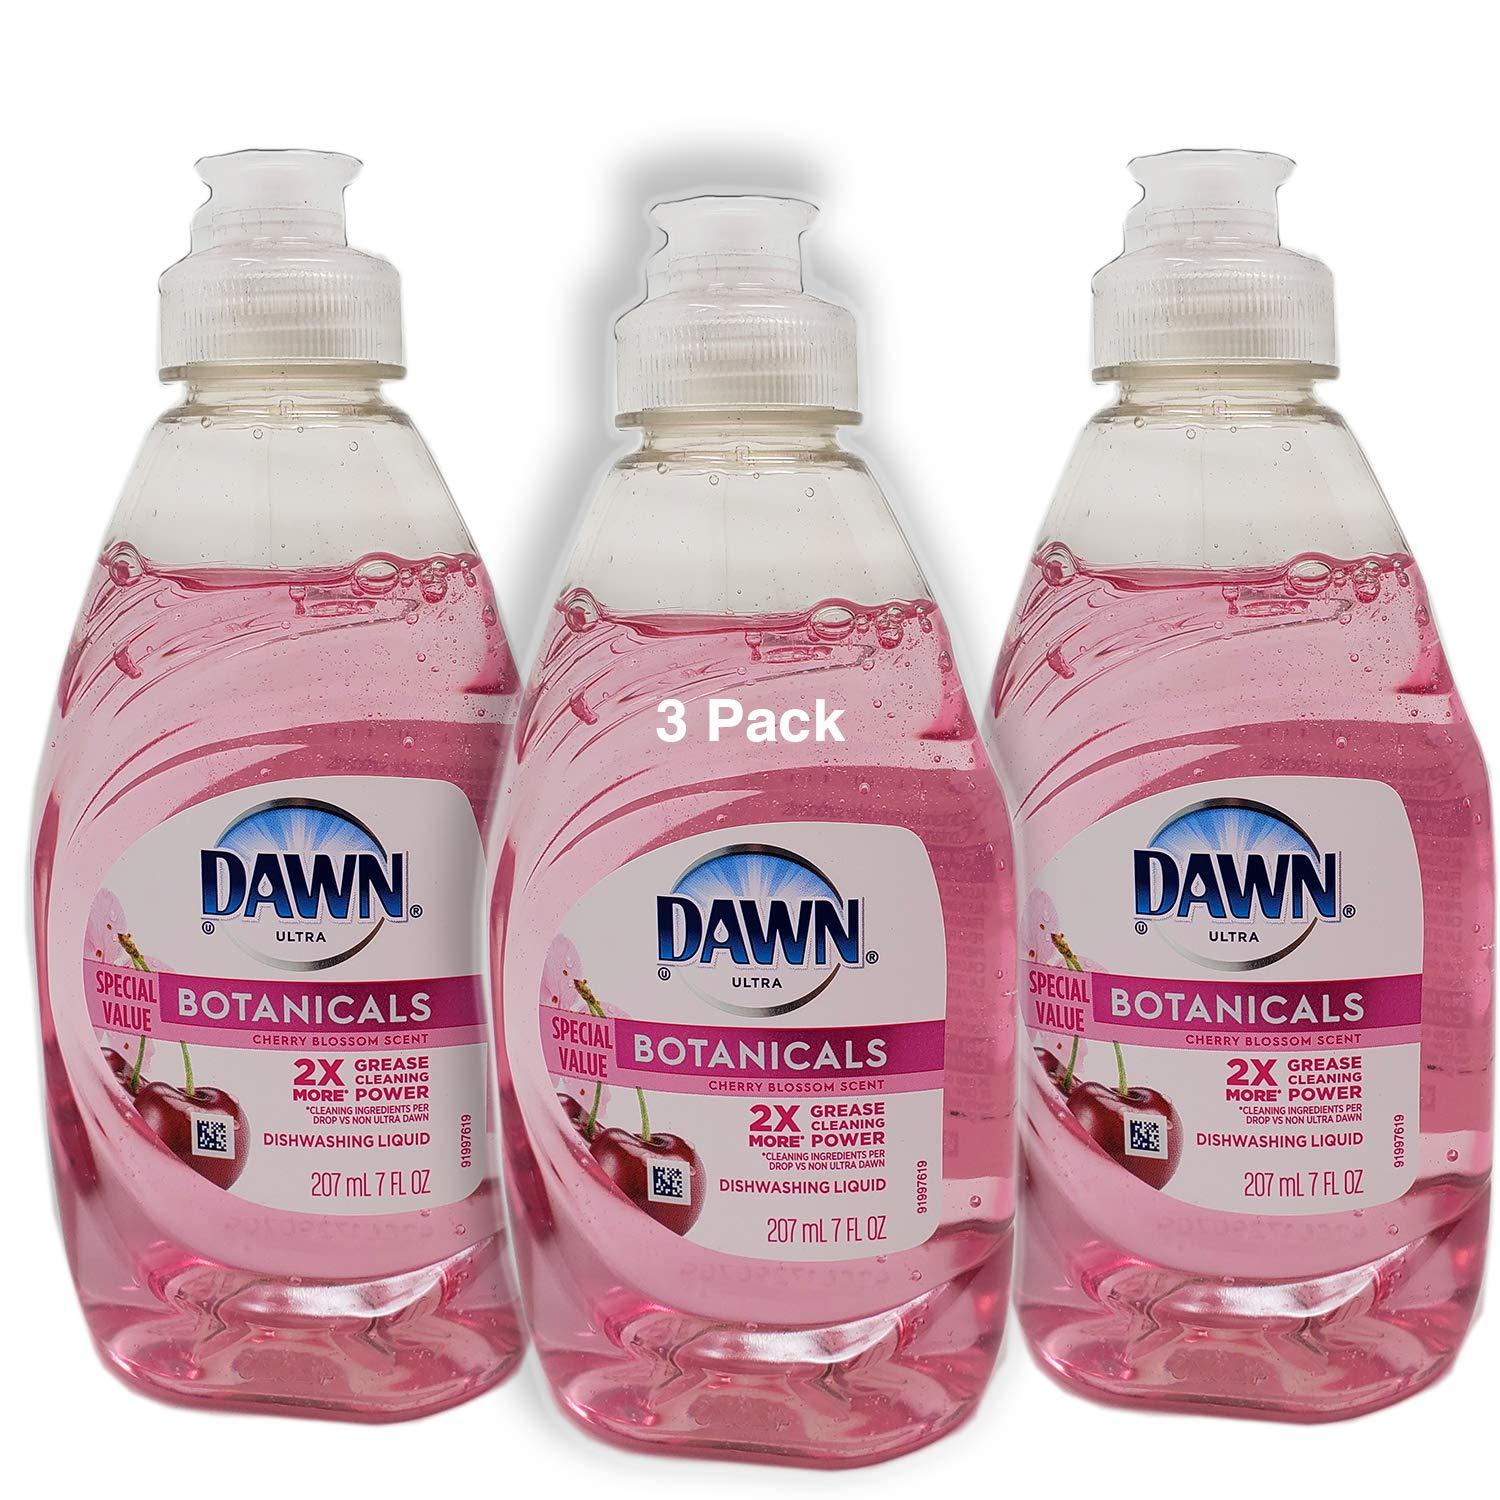 DawnUltra Jabón líquido para lavar platos, 8 onzas, aroma de ...